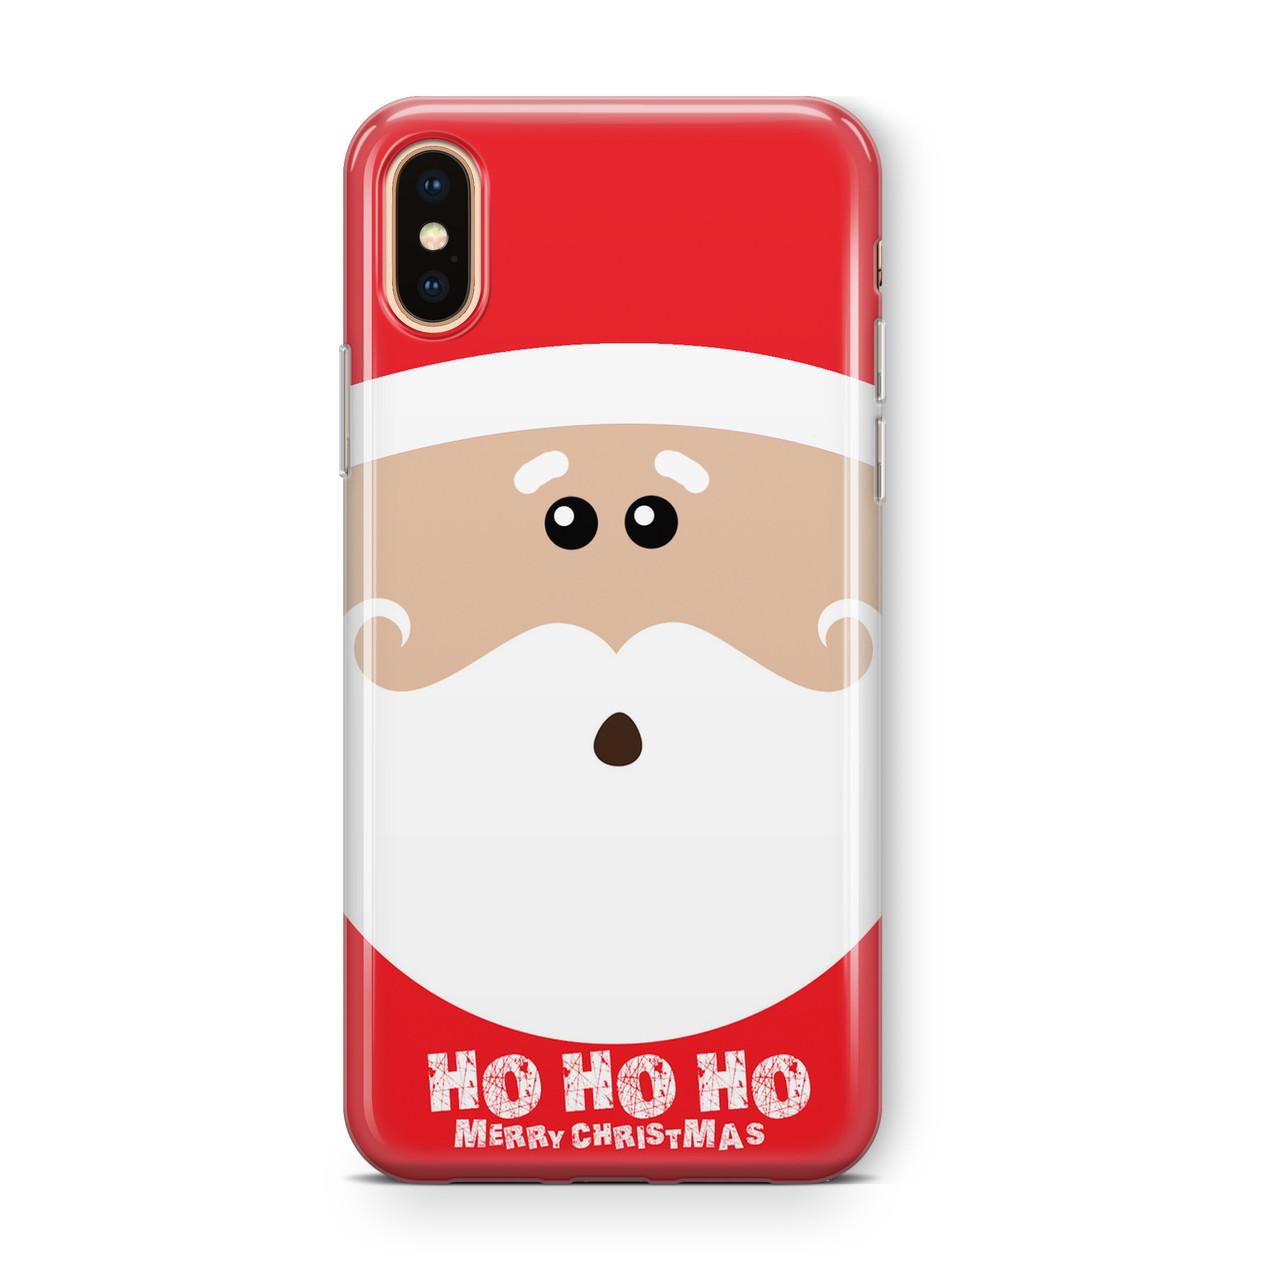 "Дизайнерский пластиковый новогодний чехол для iPhone X/ XS /Xr /XS Max, с дедом морозом ""Хо-хо-хо"""